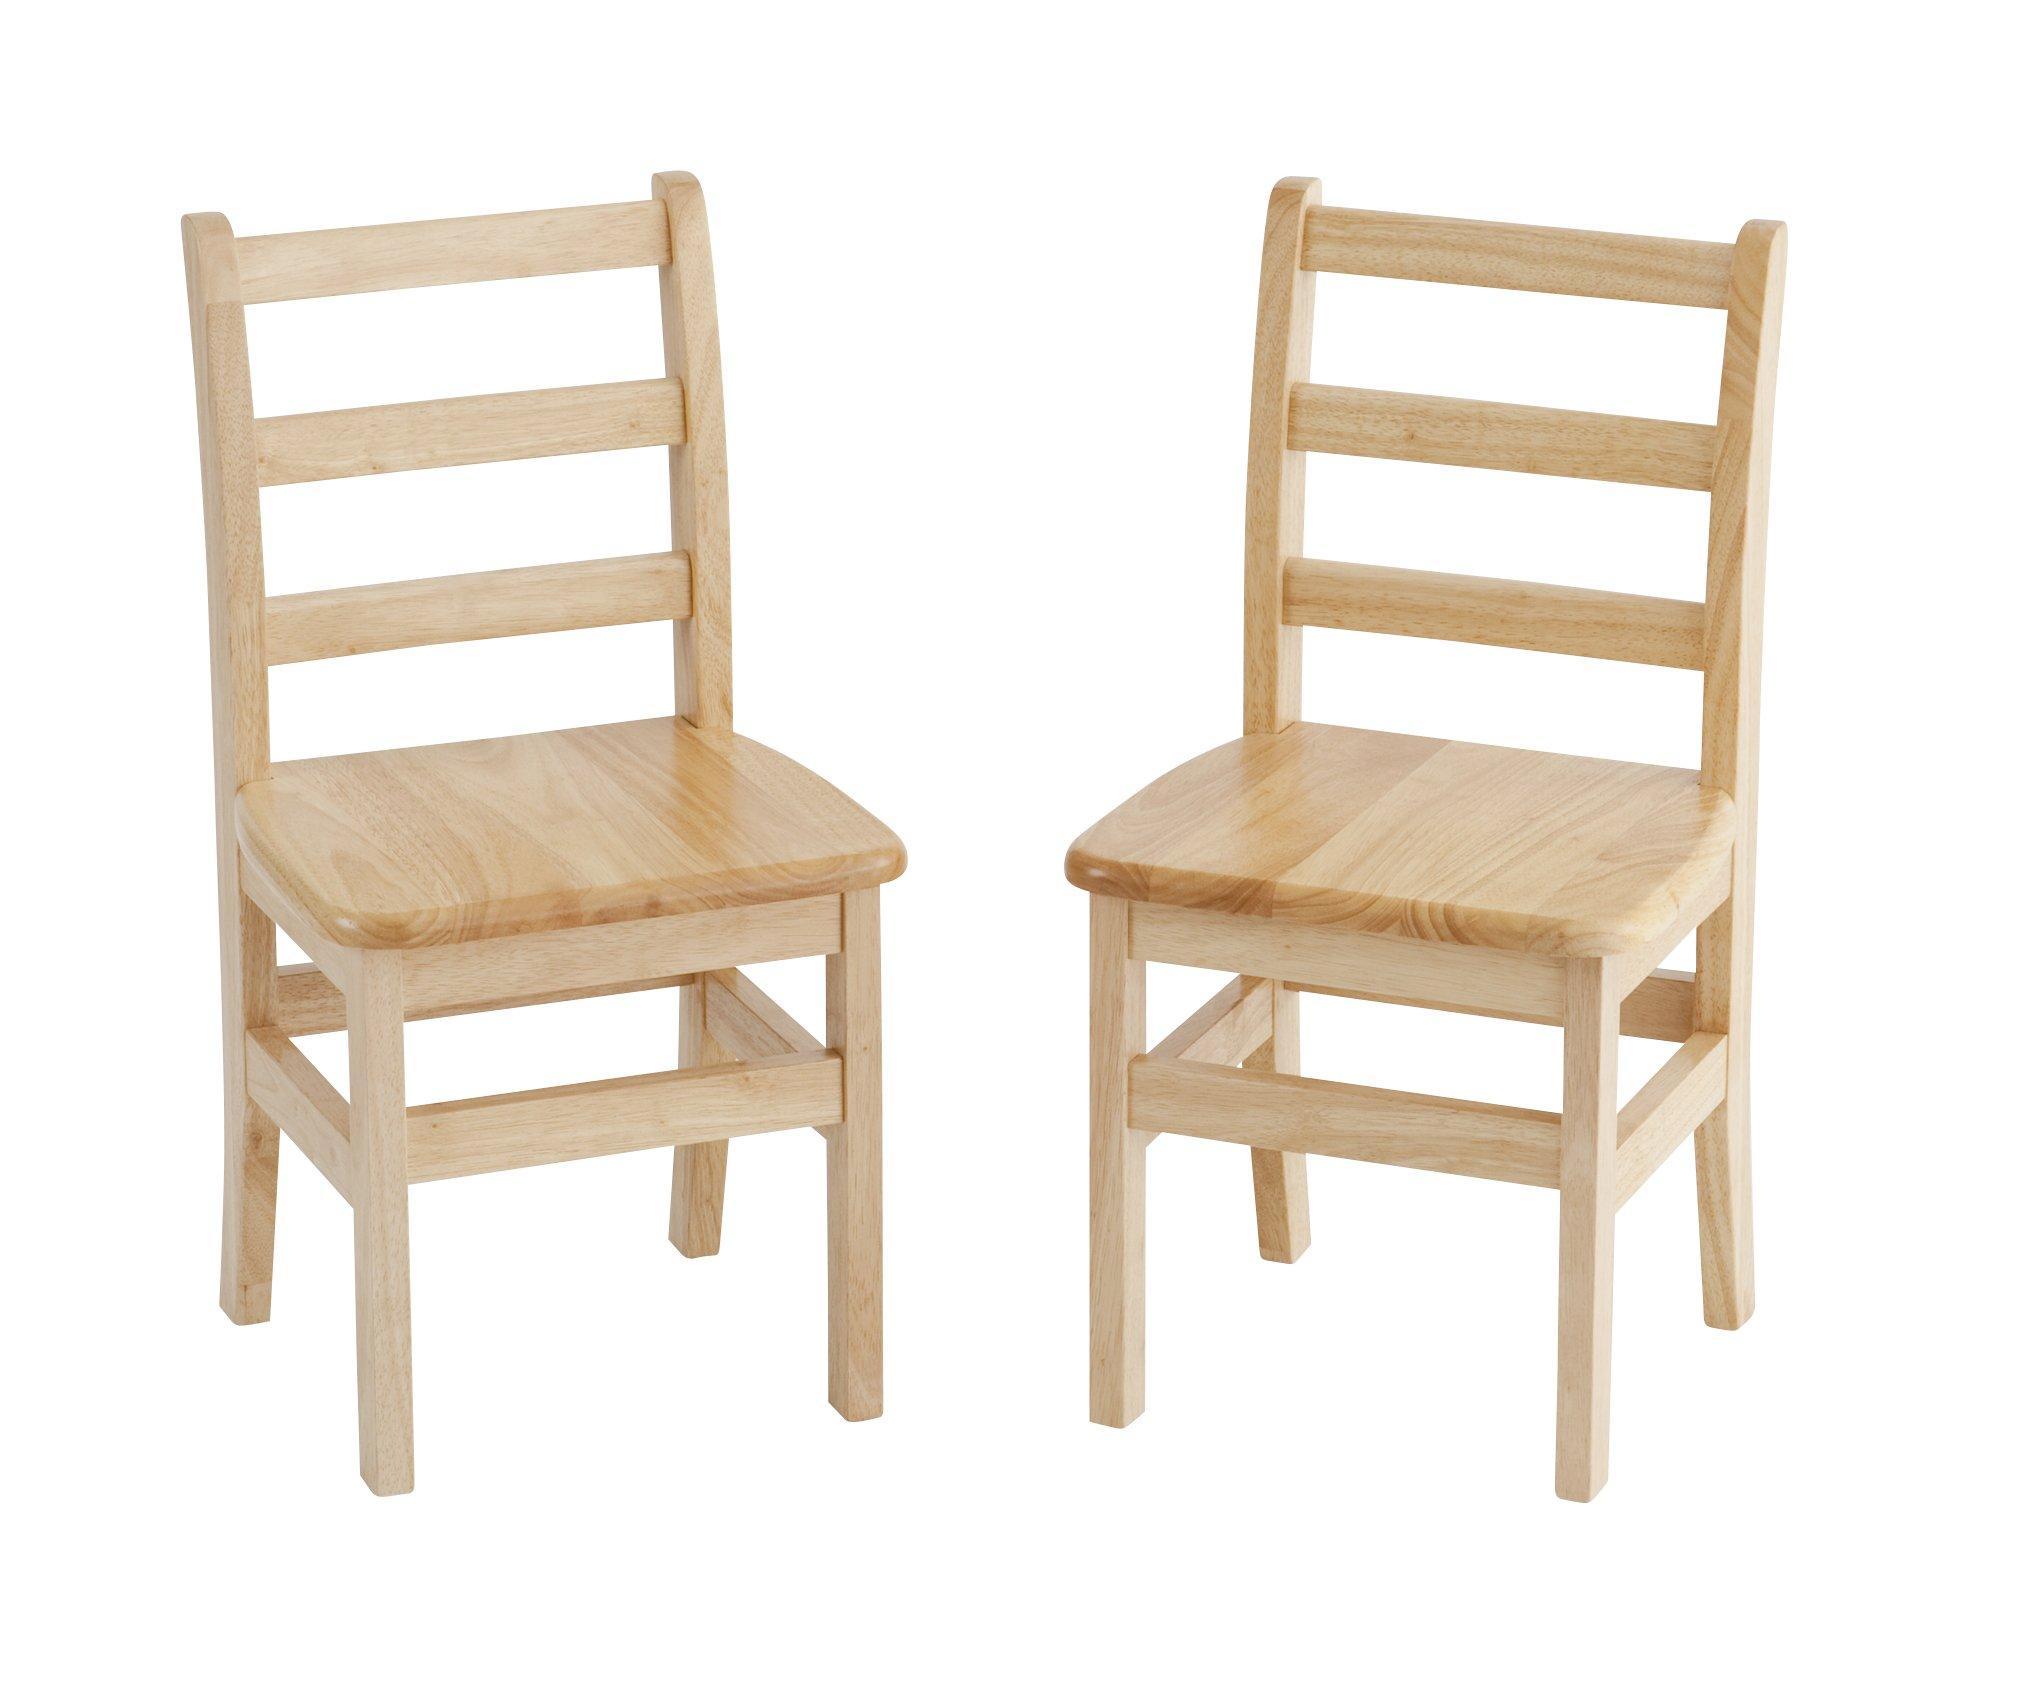 ECR4Kids 14'' Hardwood 3-Rung Ladderback Chair, Natural (2-Pack)